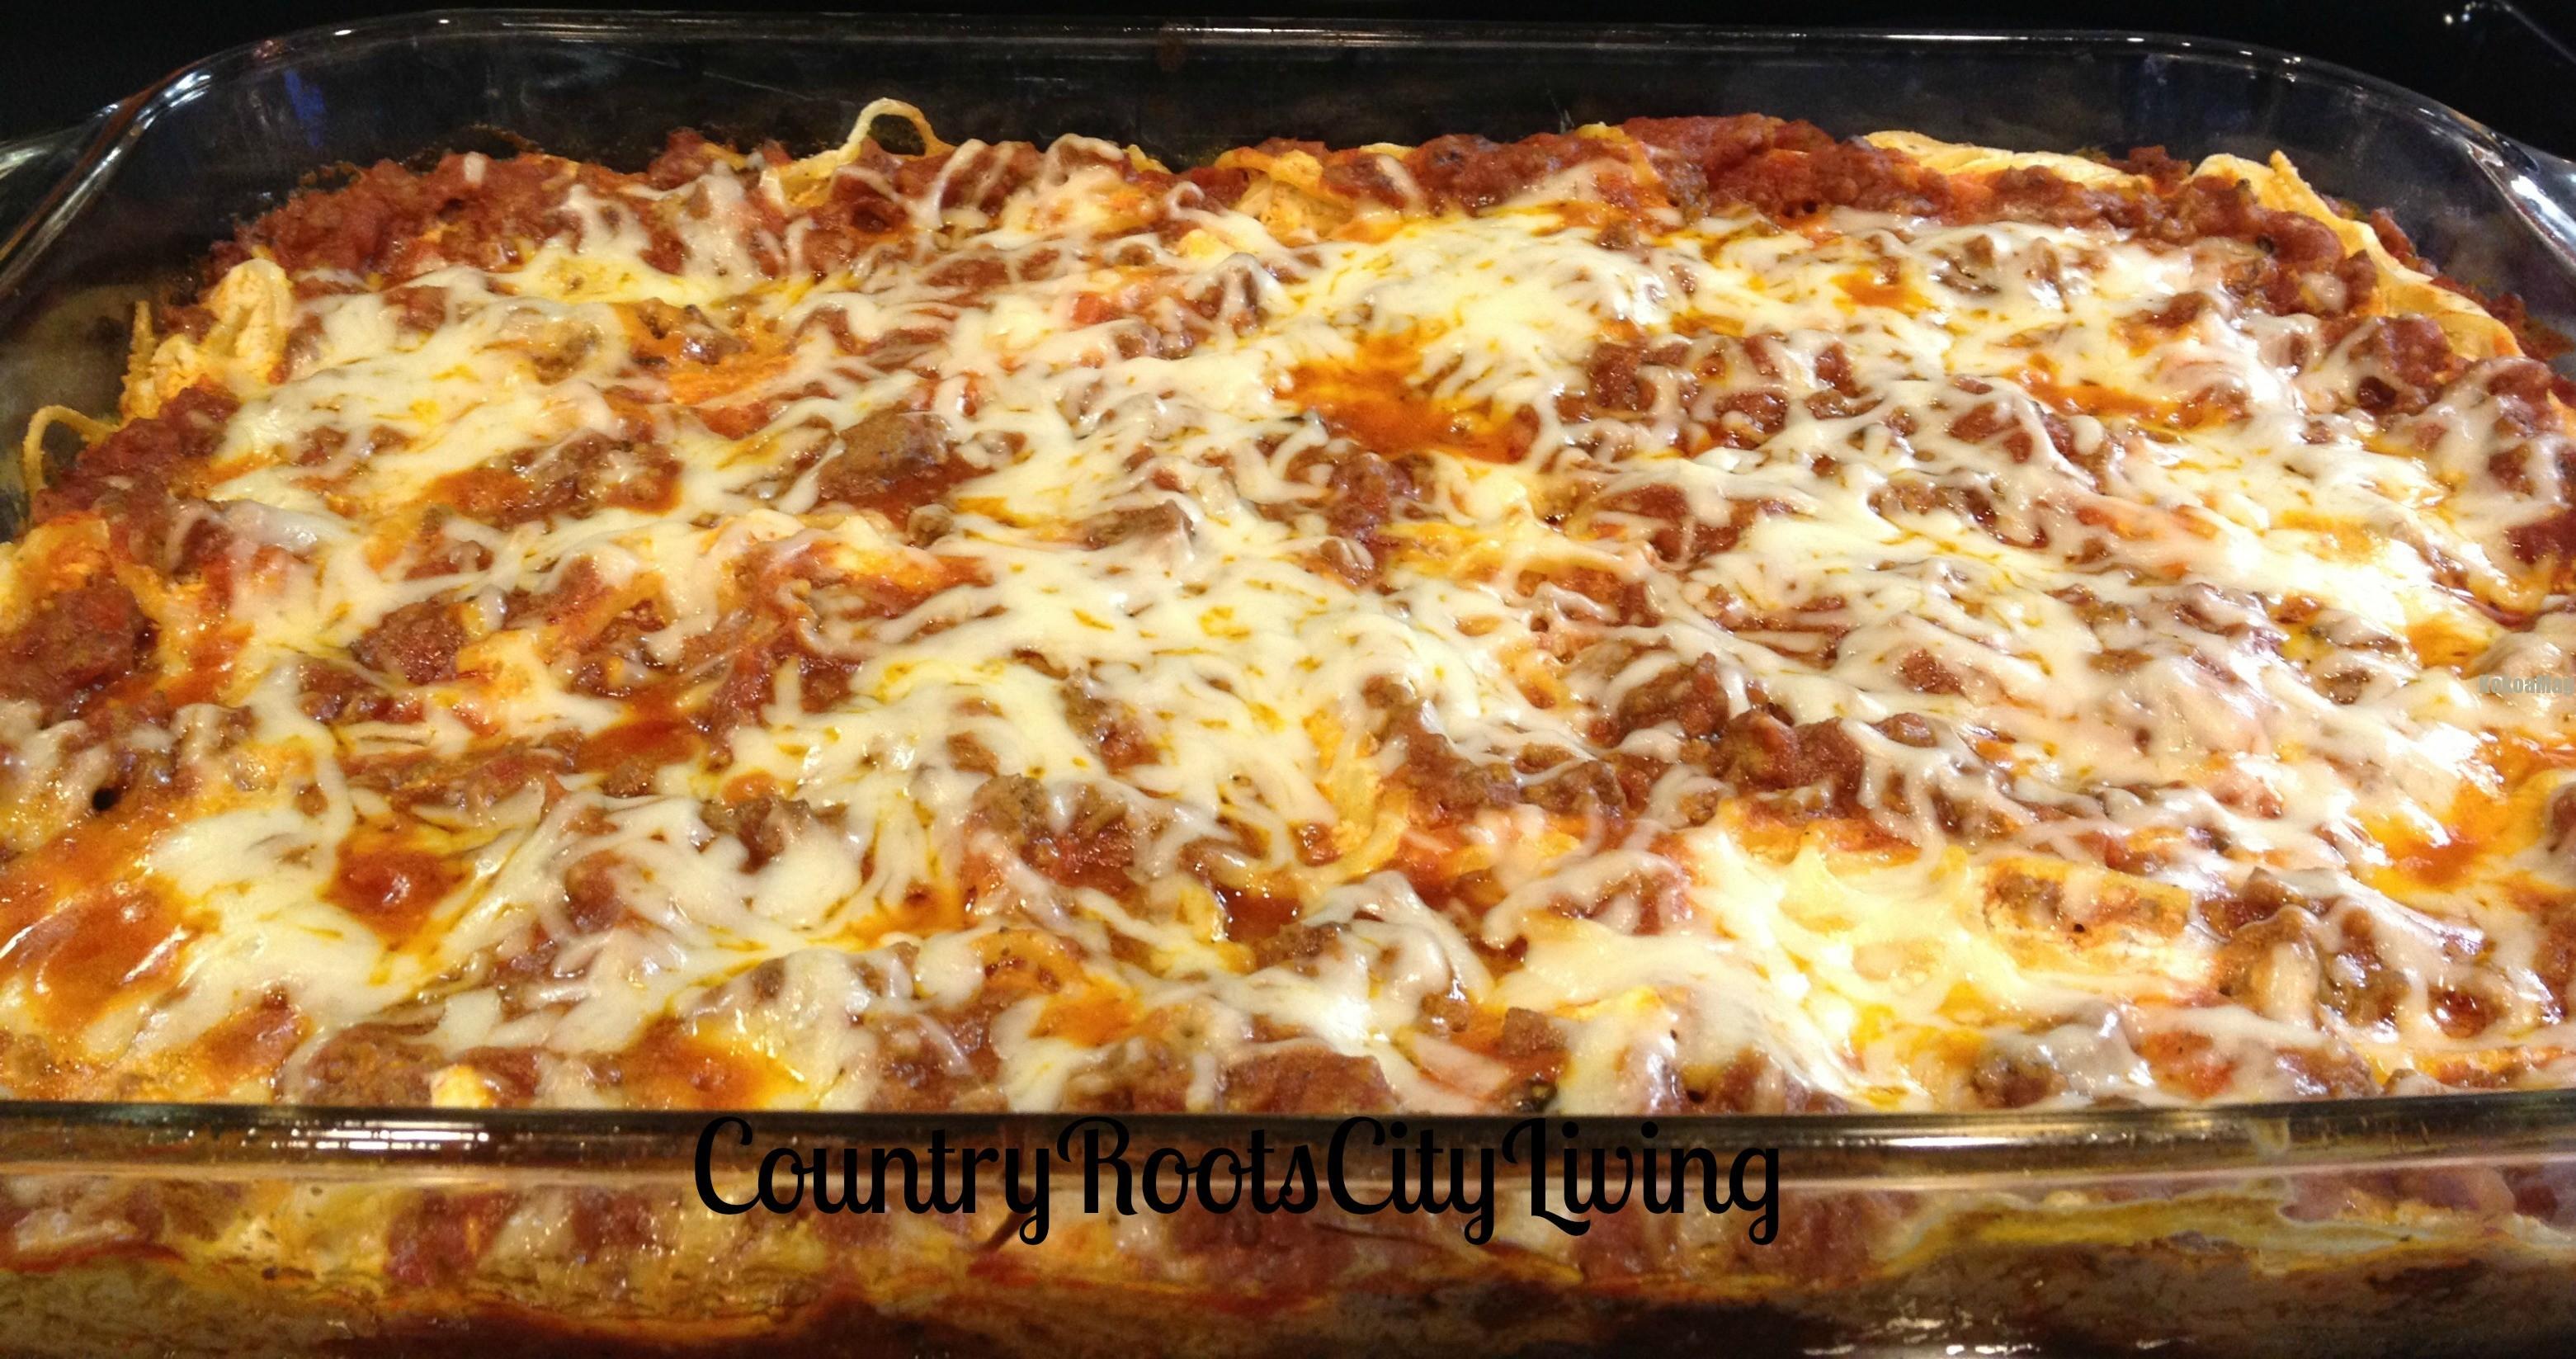 Creamy Spaghetti Casserole | KoKoa Magazine